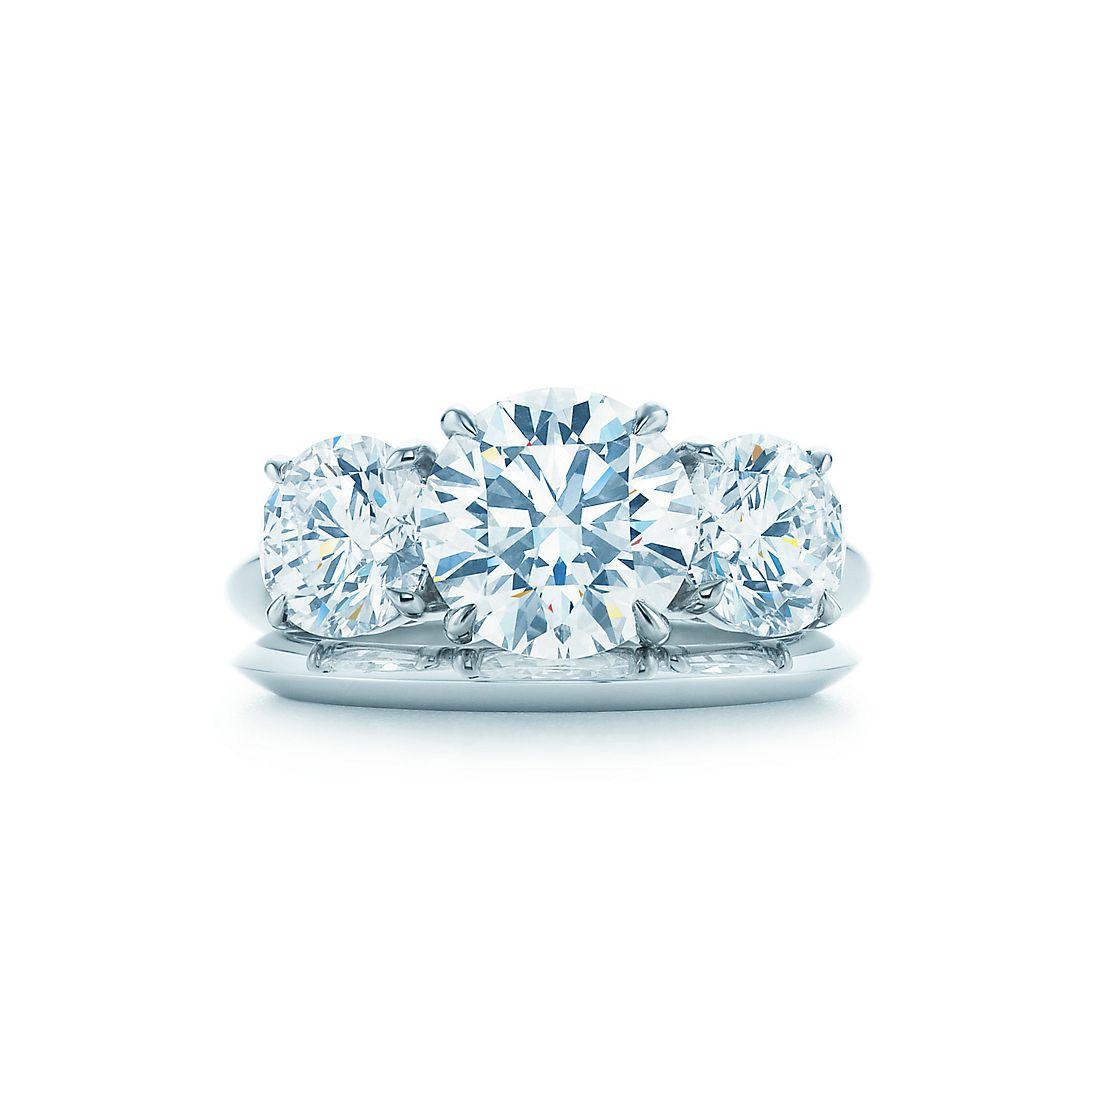 Кольцо с тремя круглыми бриллиантами Кольца для помолвки   Tiffany   Co. 8a04ace65bb